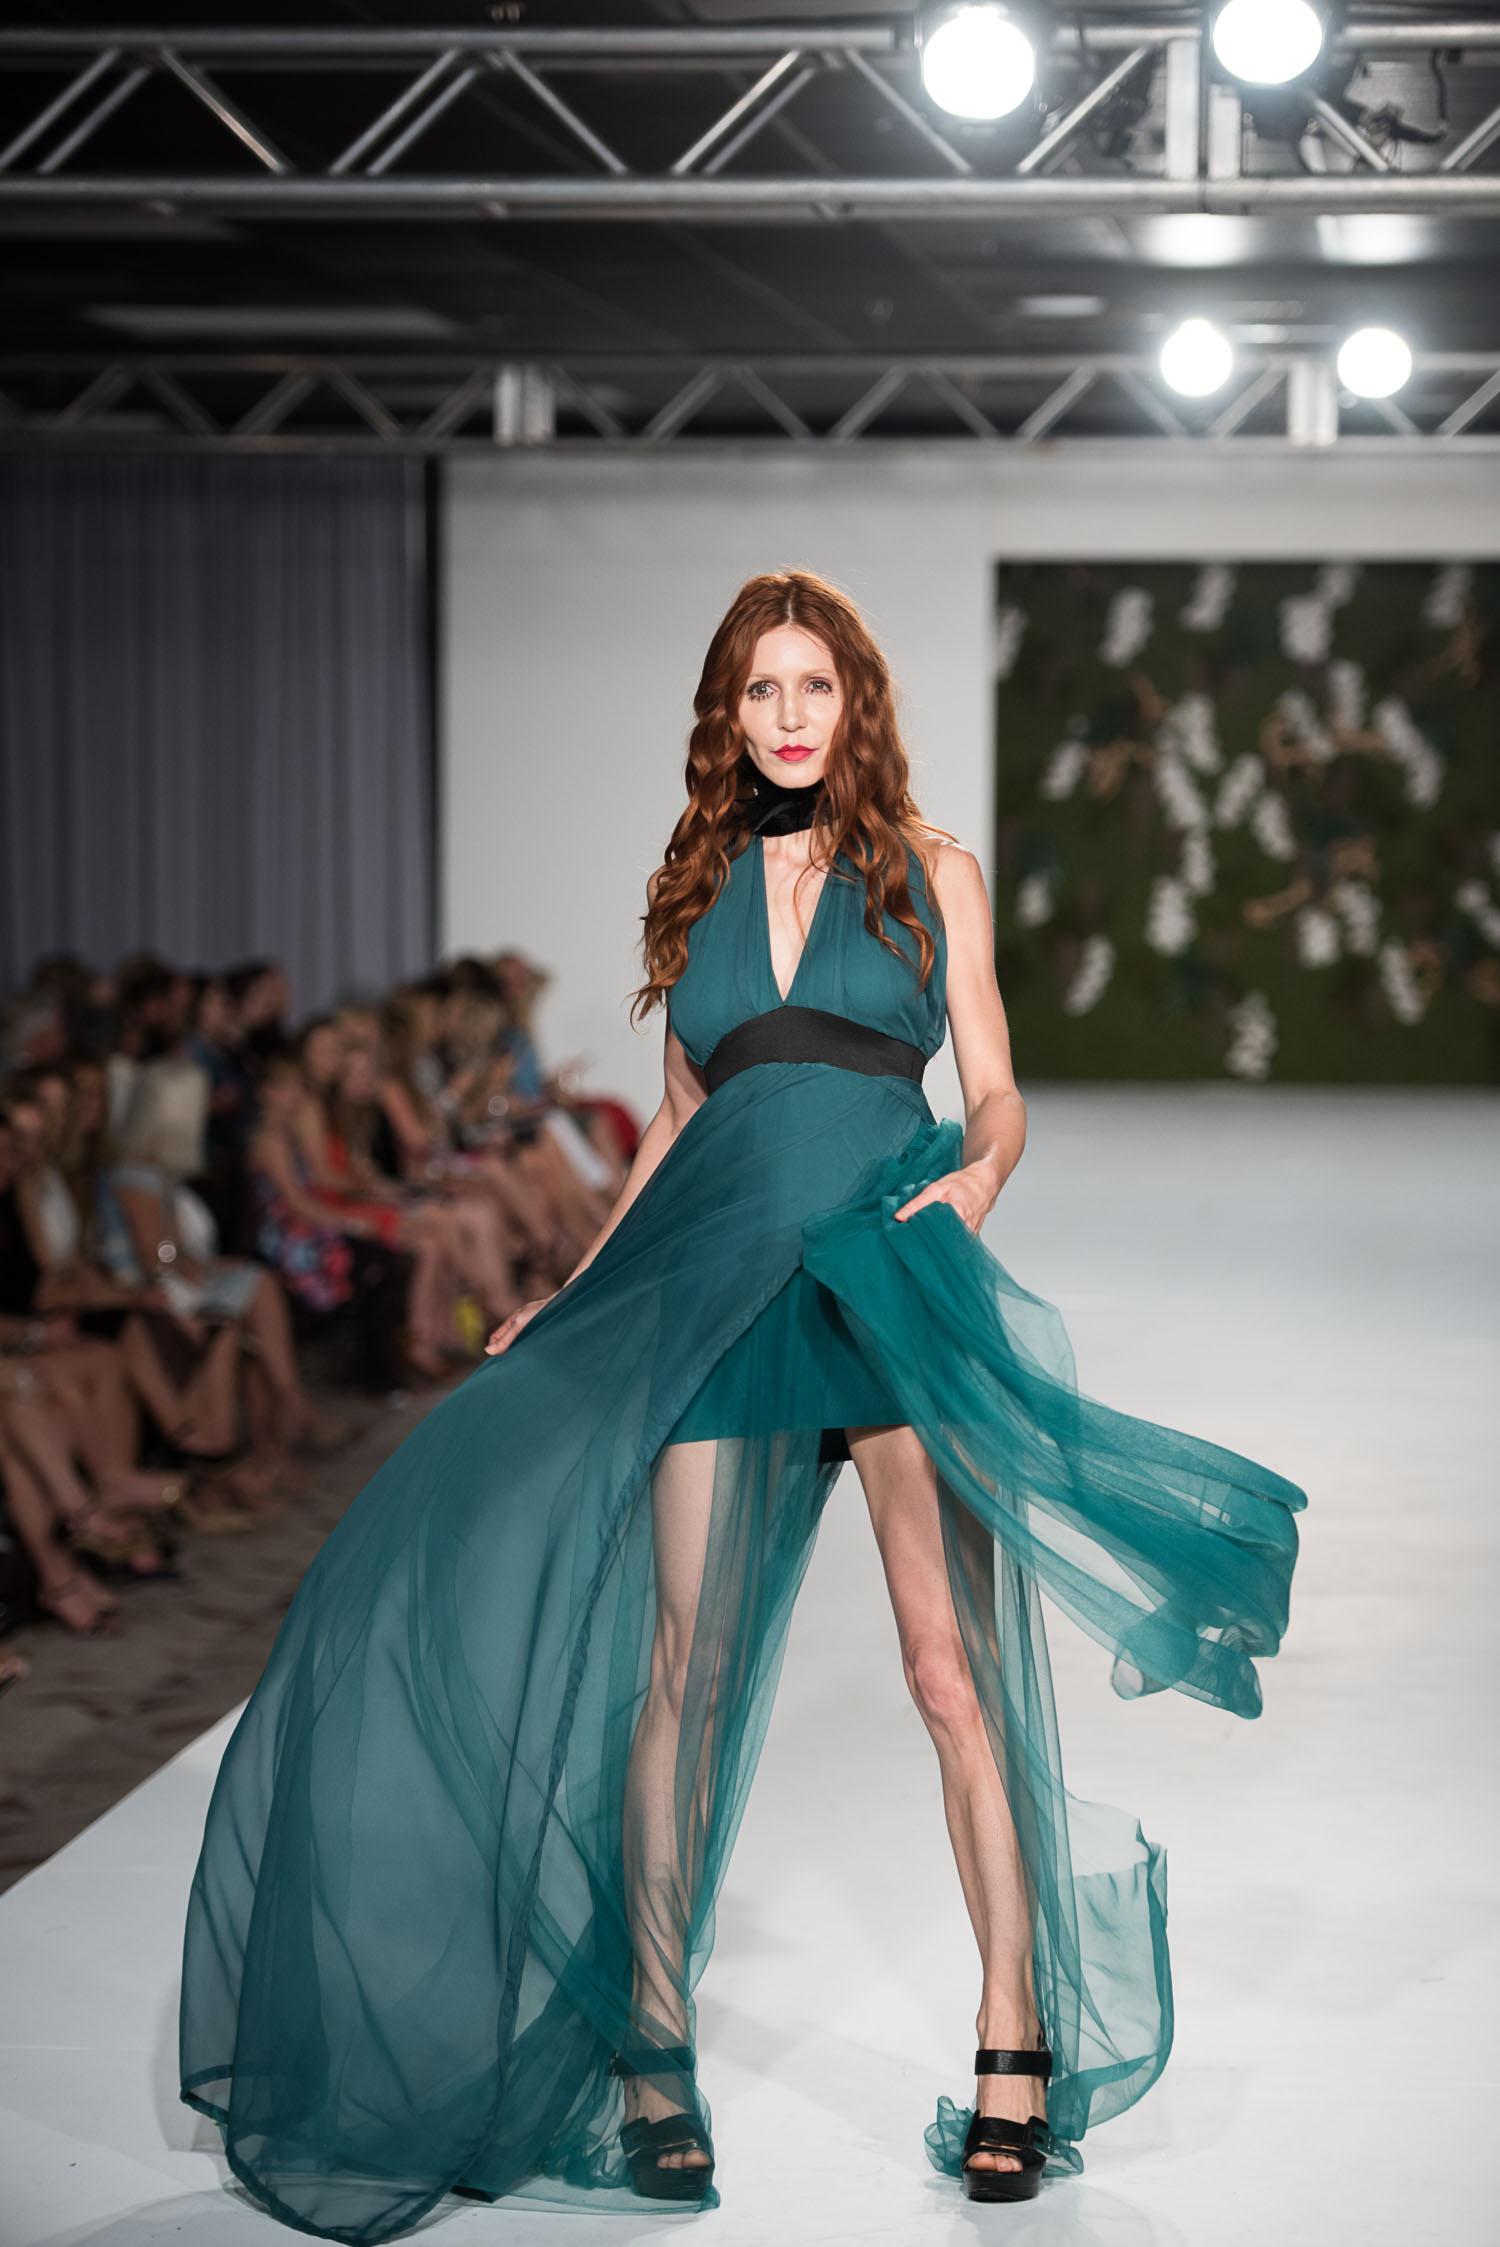 Fashion X Austin Fashion Week 2017 Mira Visu Photography with Luna Elise-130.JPG